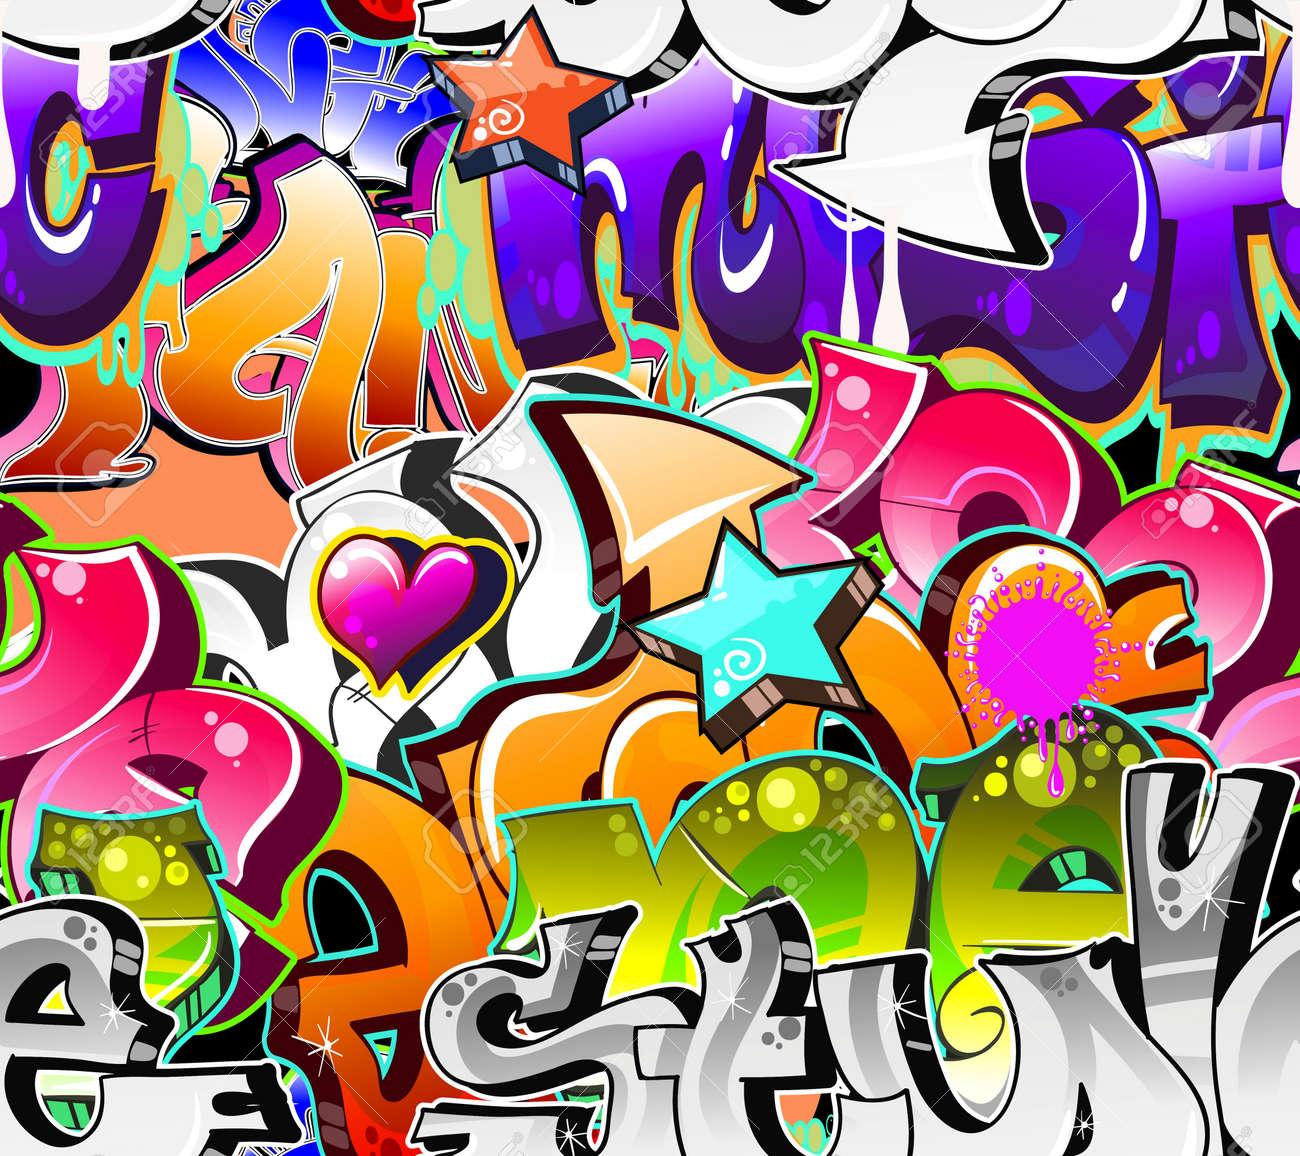 Graffiti art designs - Graffiti Background Graffiti Urban Art Background Seamless Design